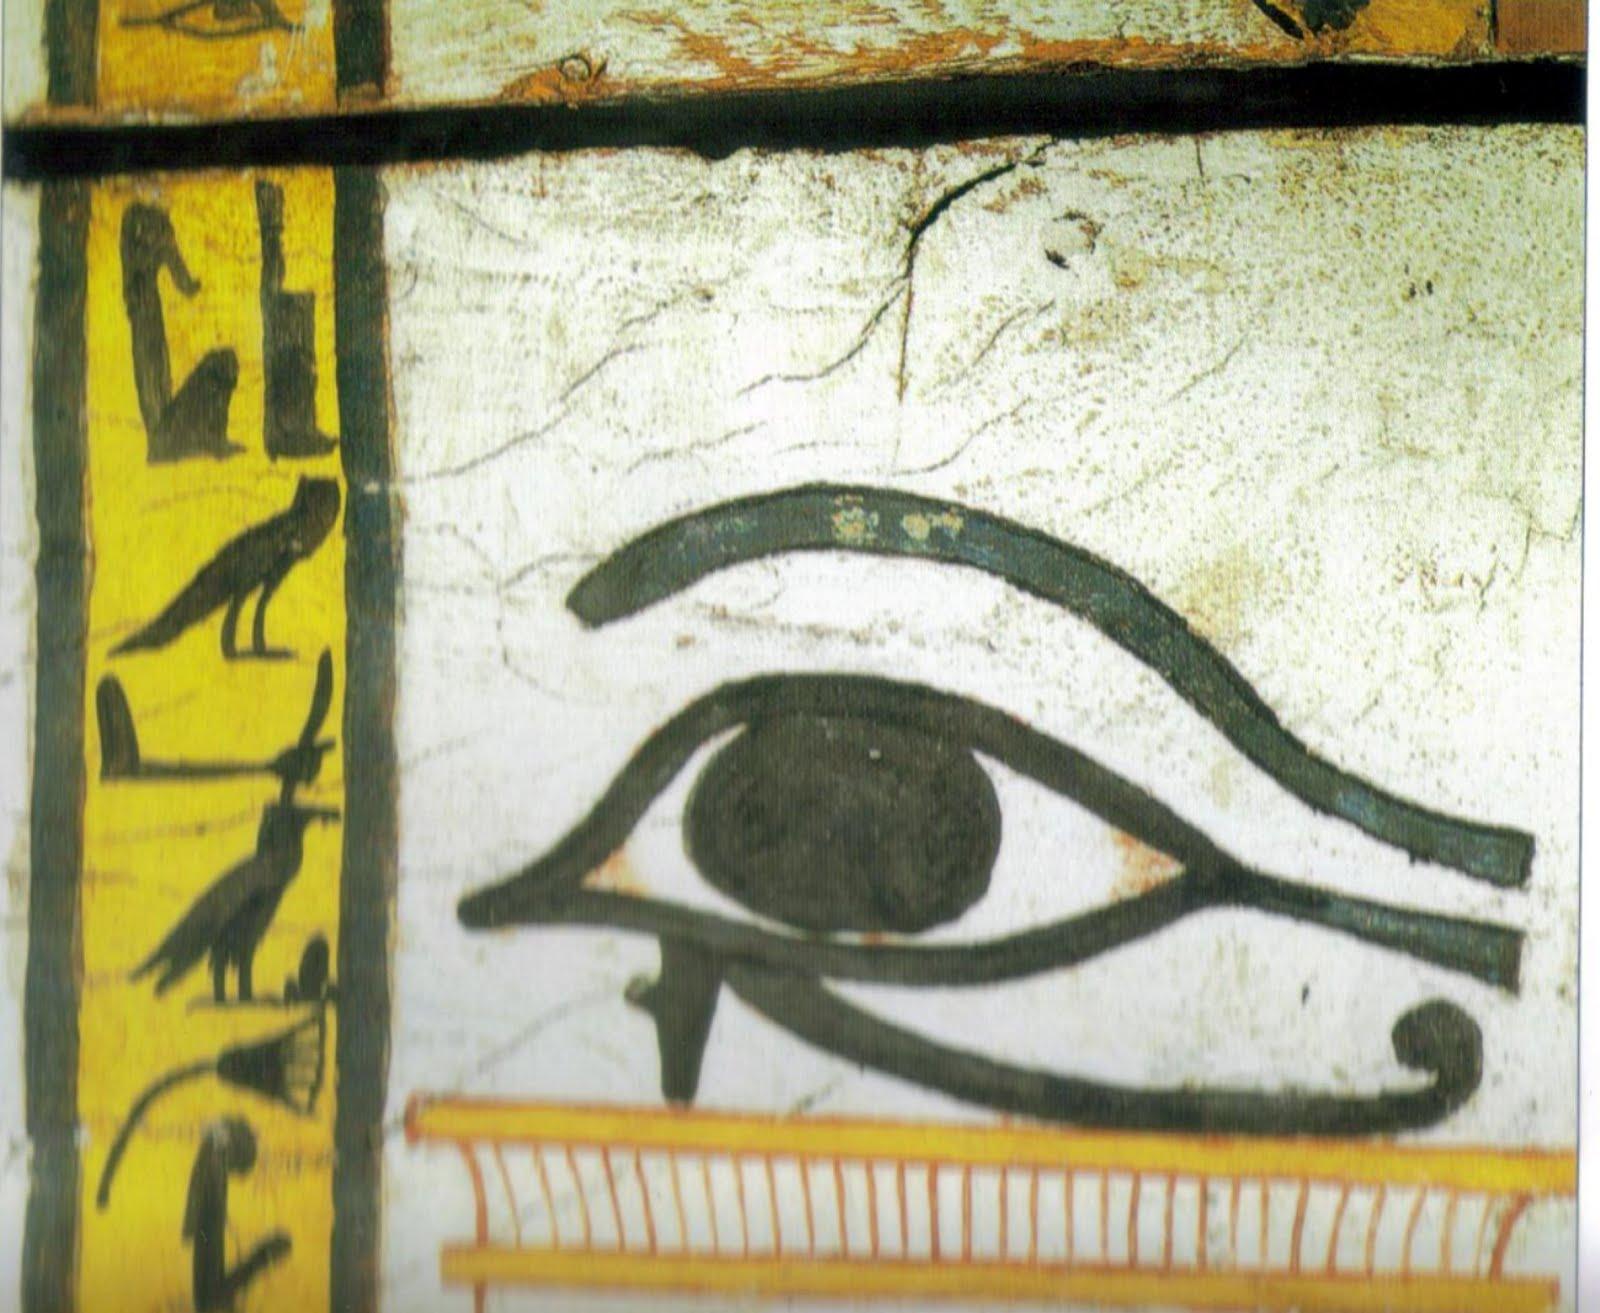 http://3.bp.blogspot.com/-7-2rm7kyuxU/UJ_JSgGjdQI/AAAAAAAAJc0/zgHGV-ZRWJg/s1600/eye-of-horus.jpg